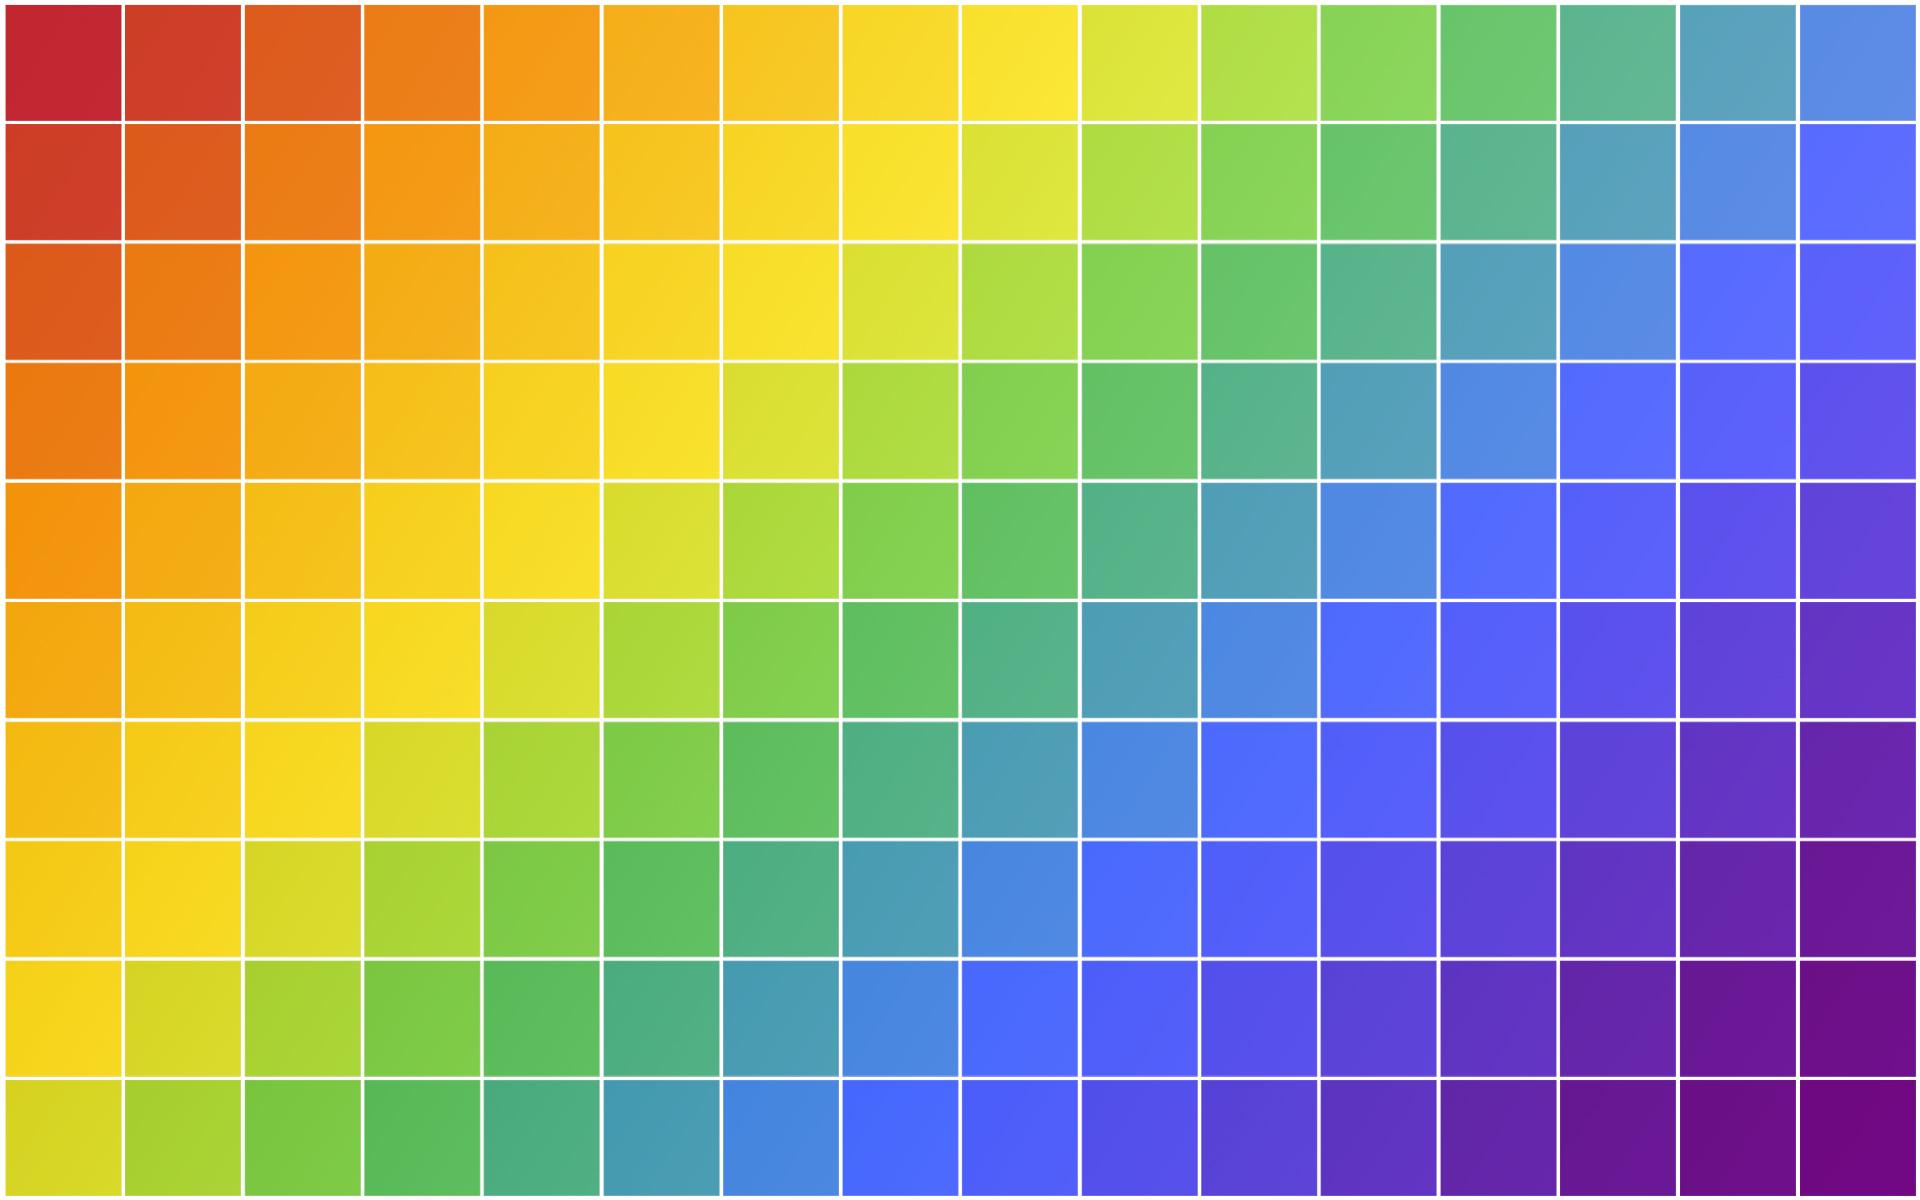 Rainbow iphone wallpaper tumblr - Rainbow Wolf